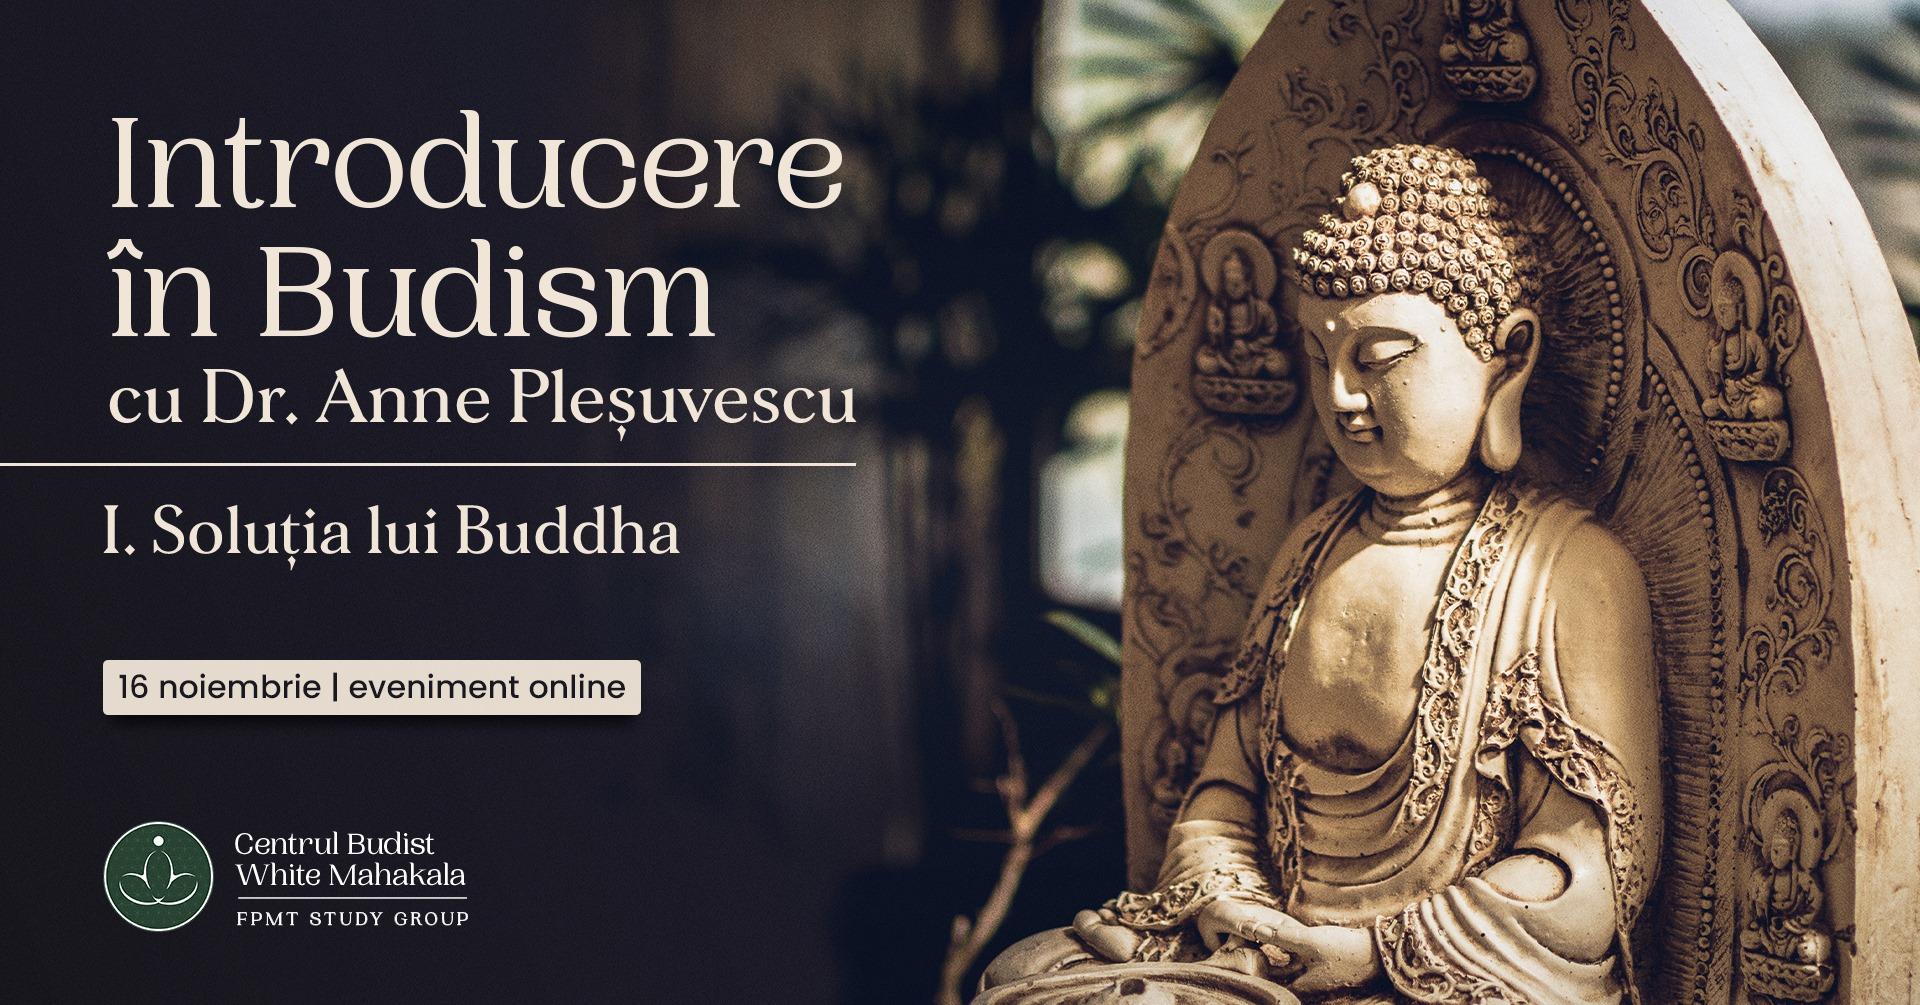 Curs introductiv despre budism